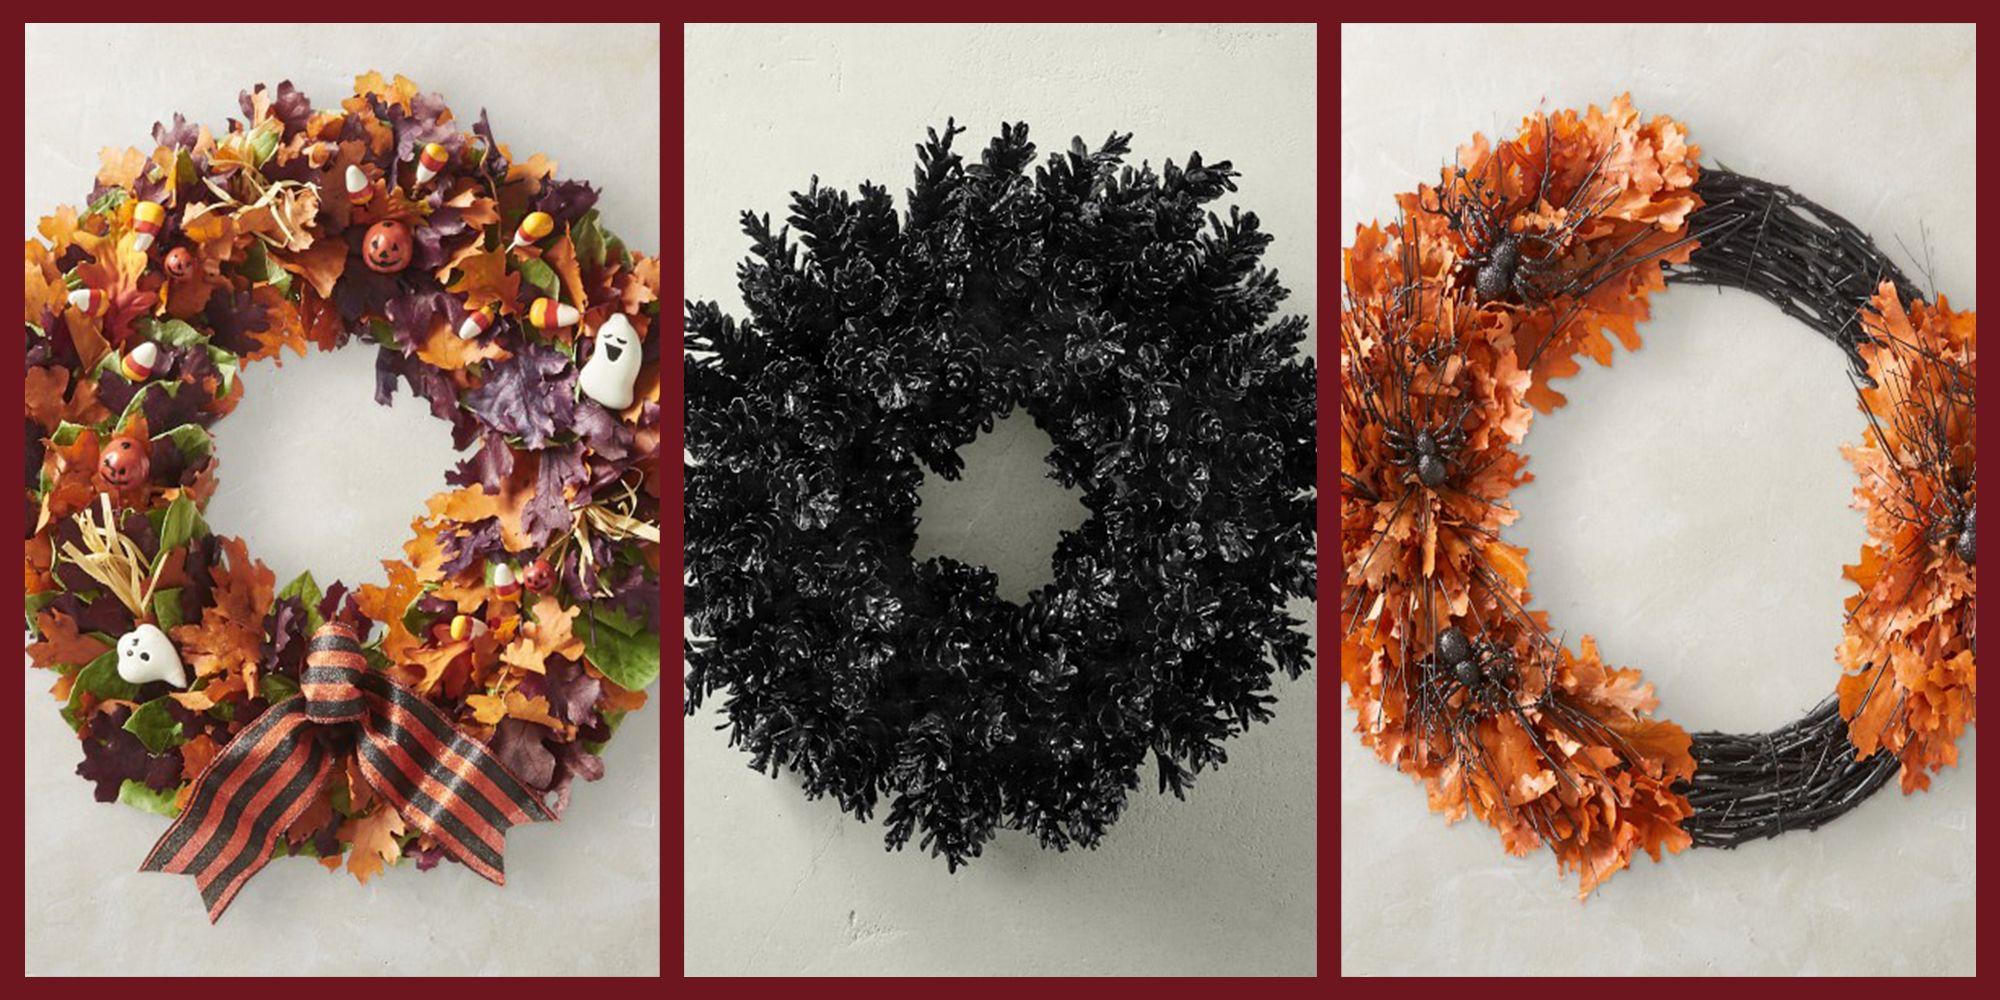 13 Best Halloween Wreaths For Fall 2020 Festive Halloween Door Decorations